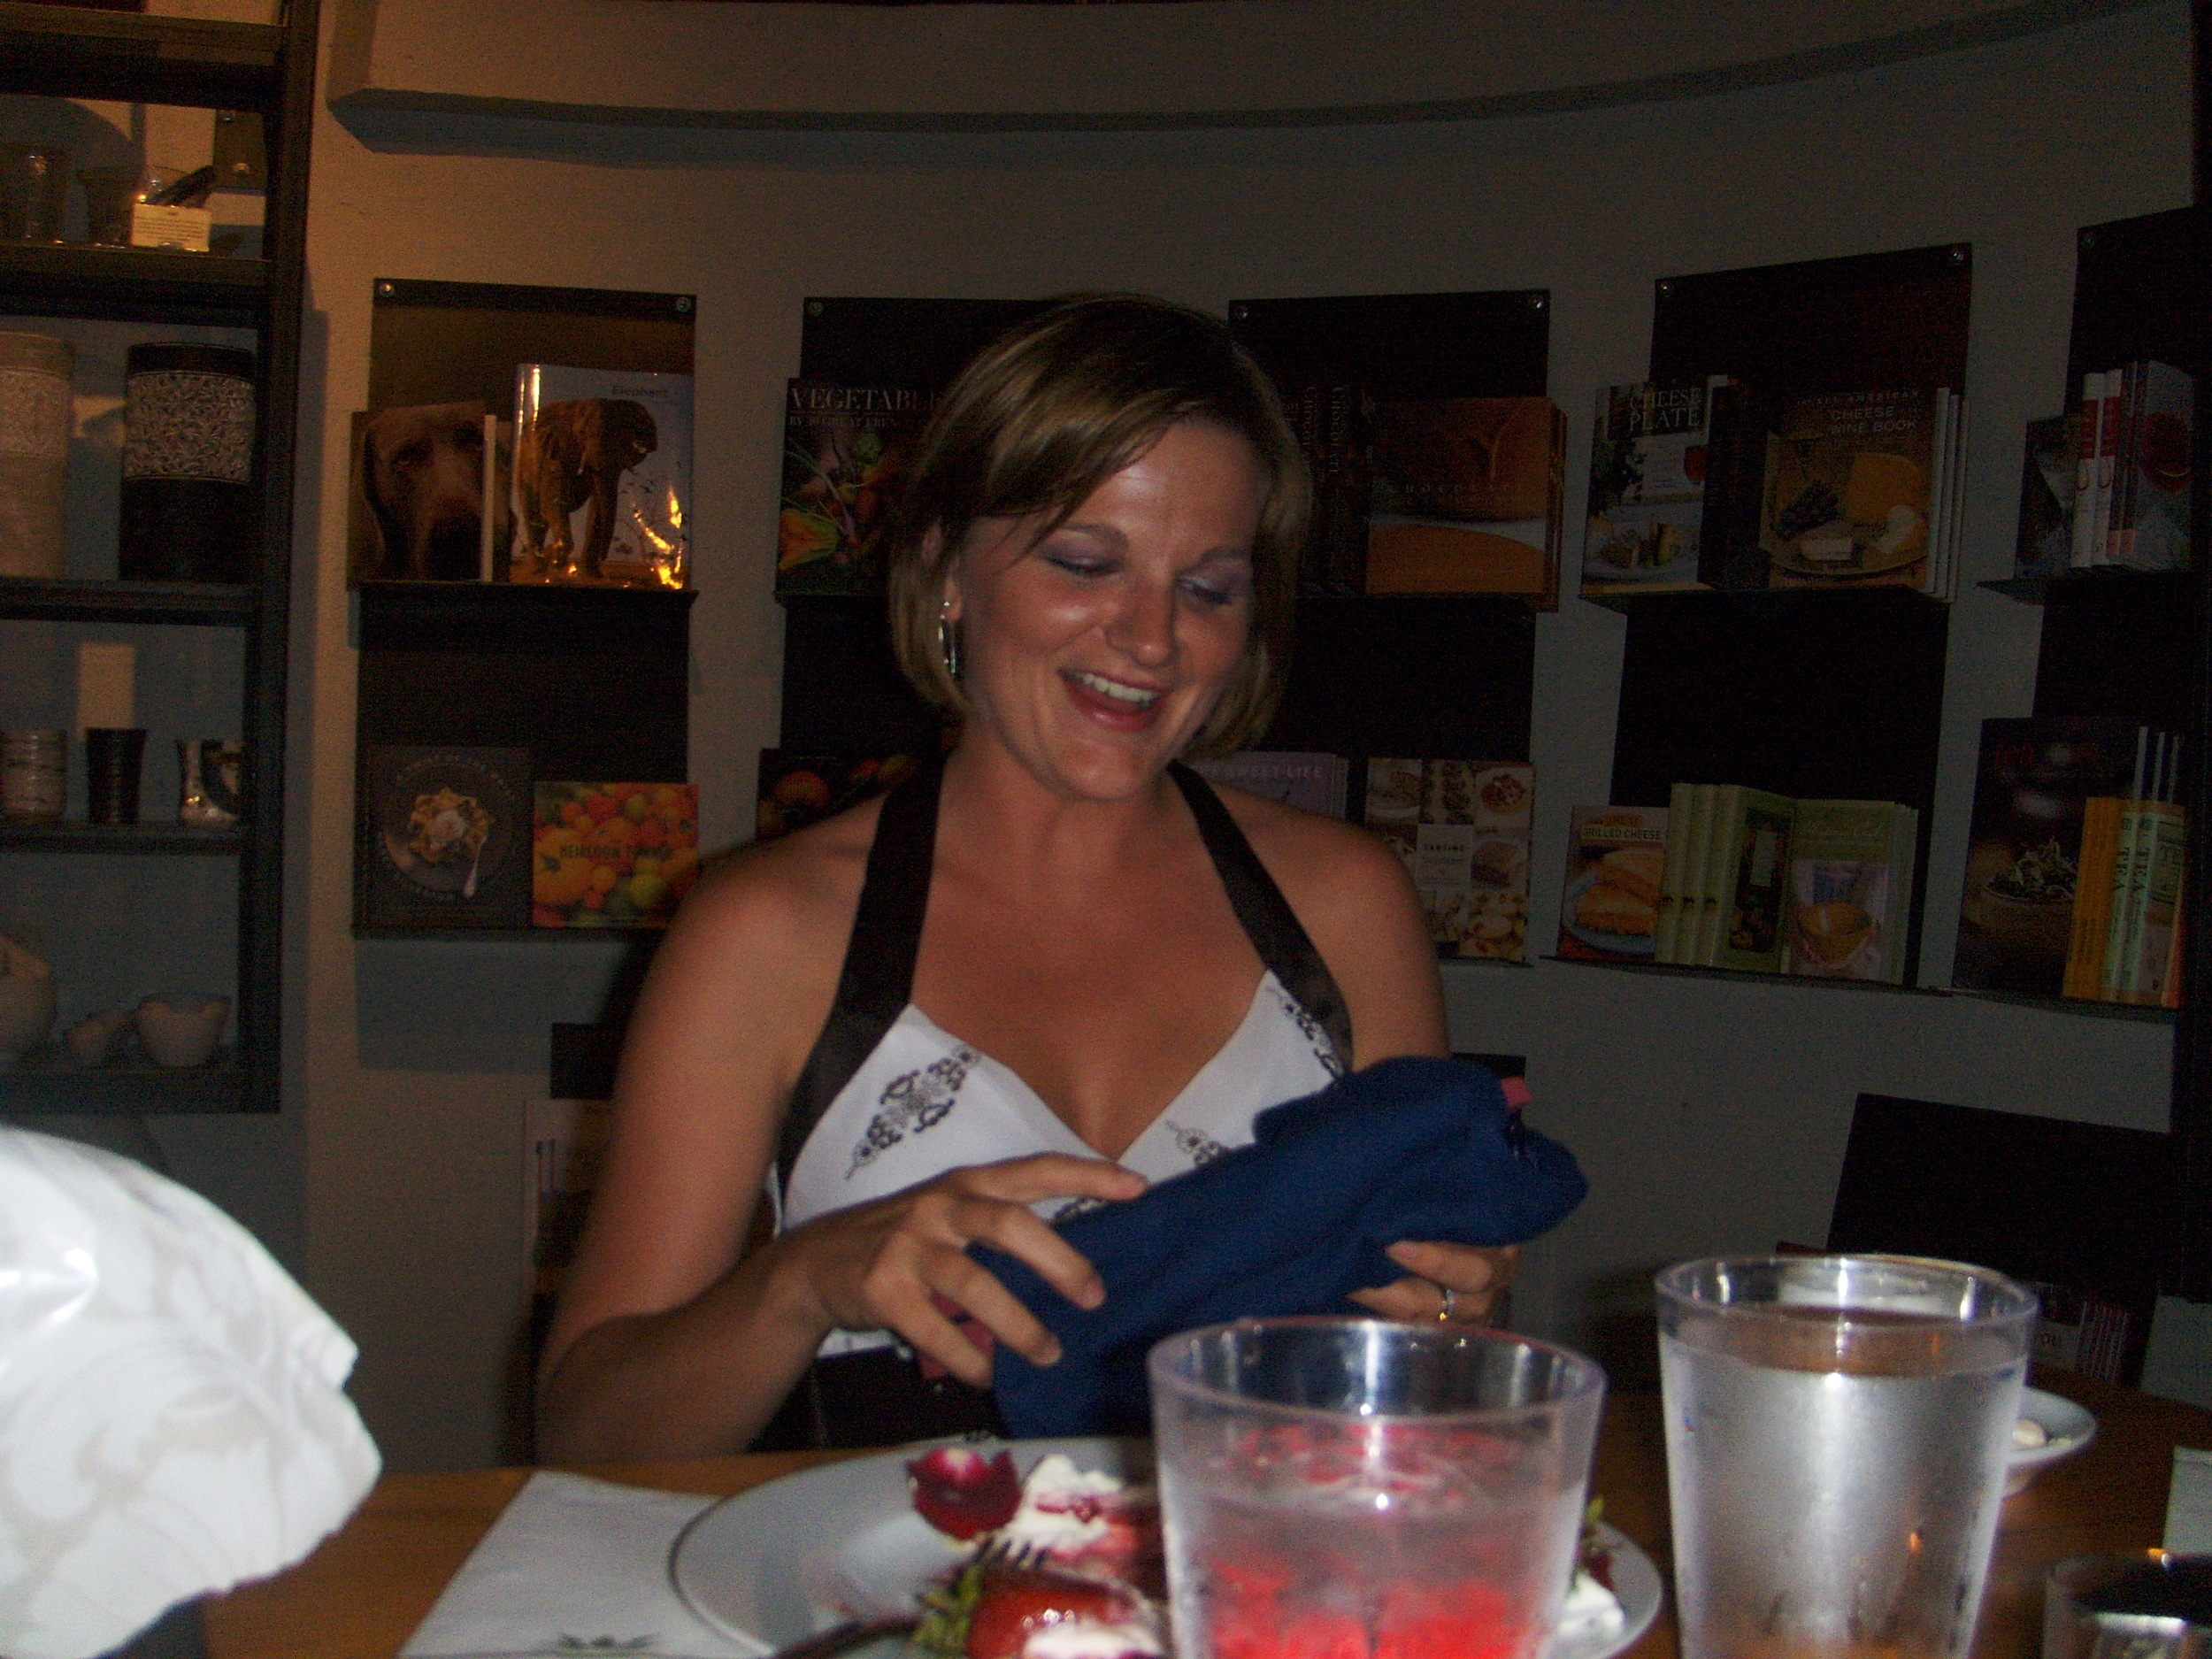 Heather'sdesigner wallet for her birthday!